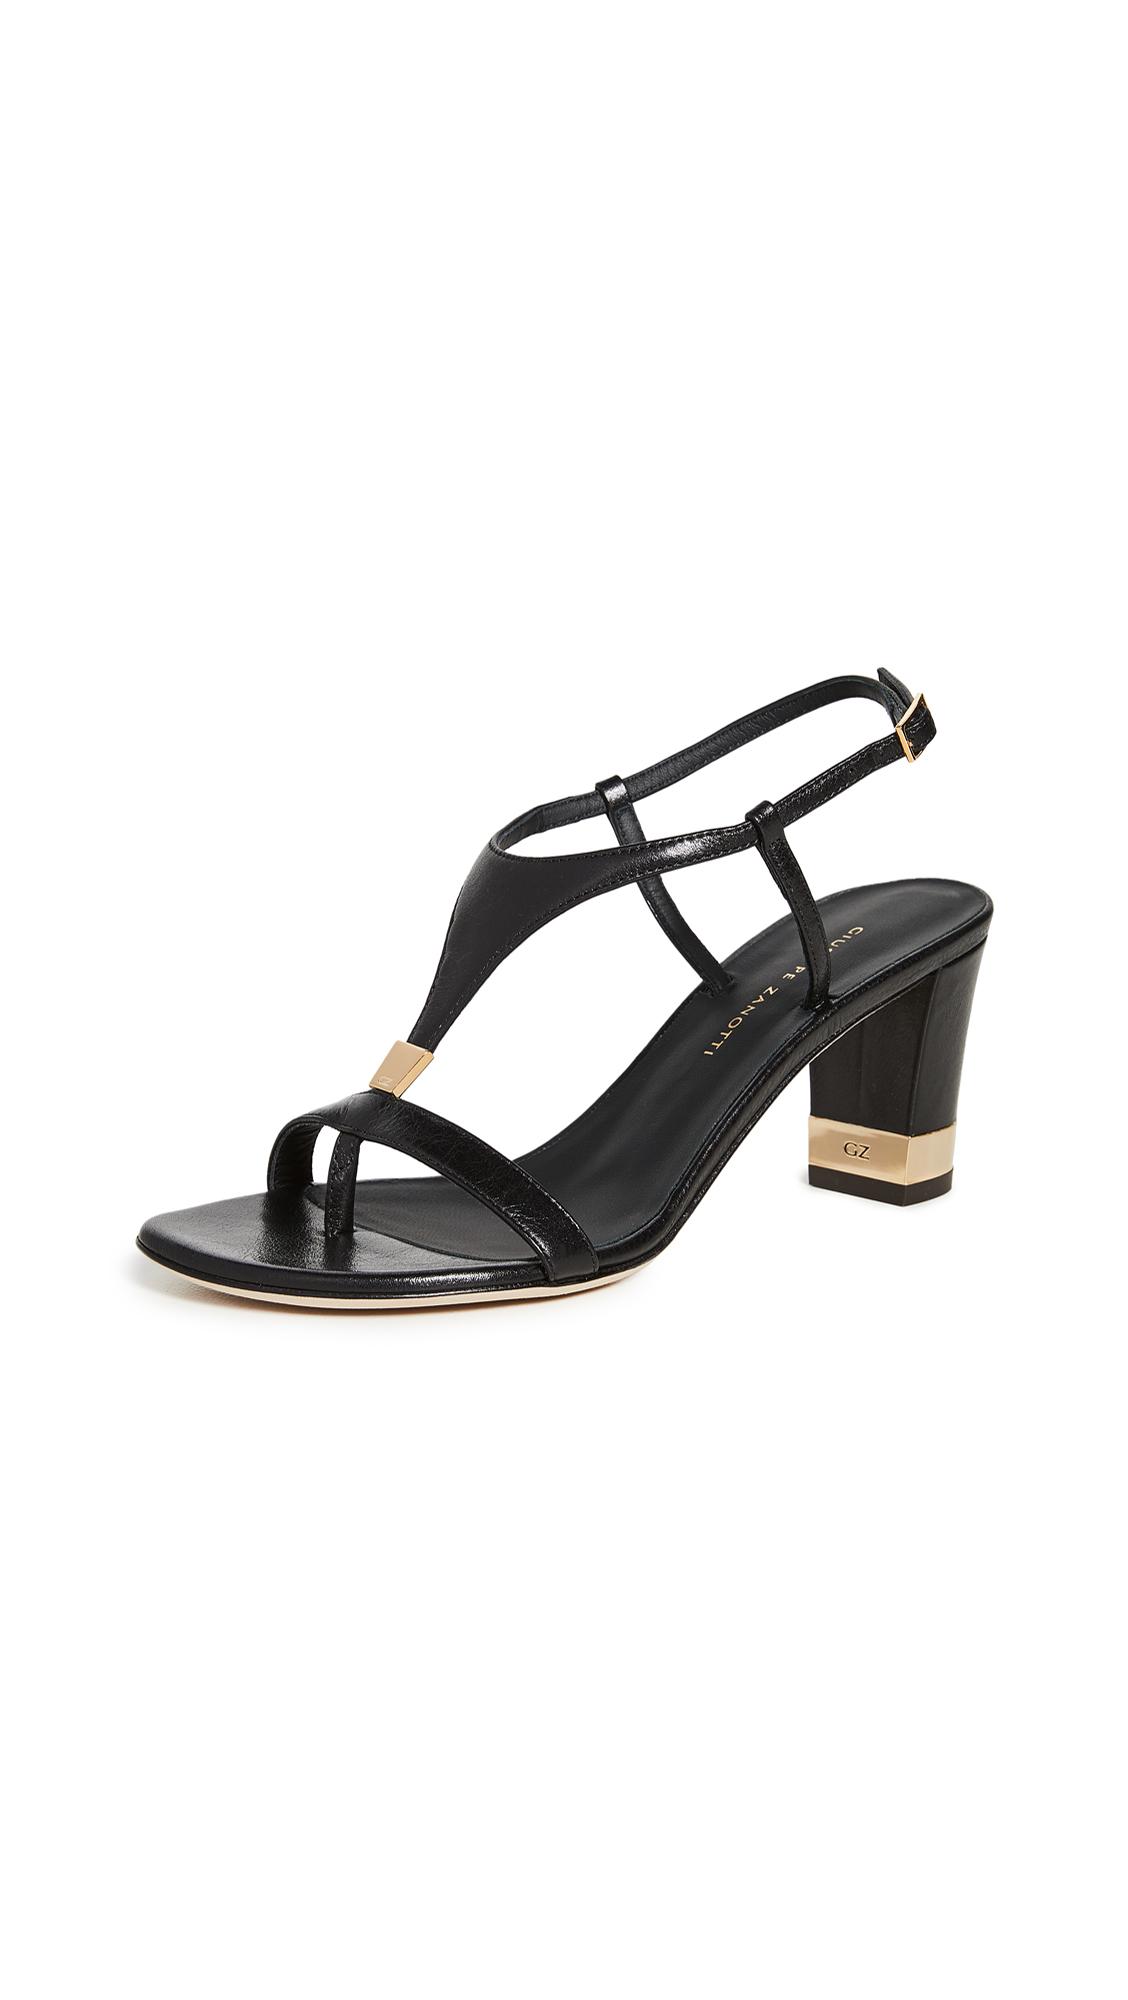 Buy Giuseppe Zanotti Helmut 105 Sandals online, shop Giuseppe Zanotti